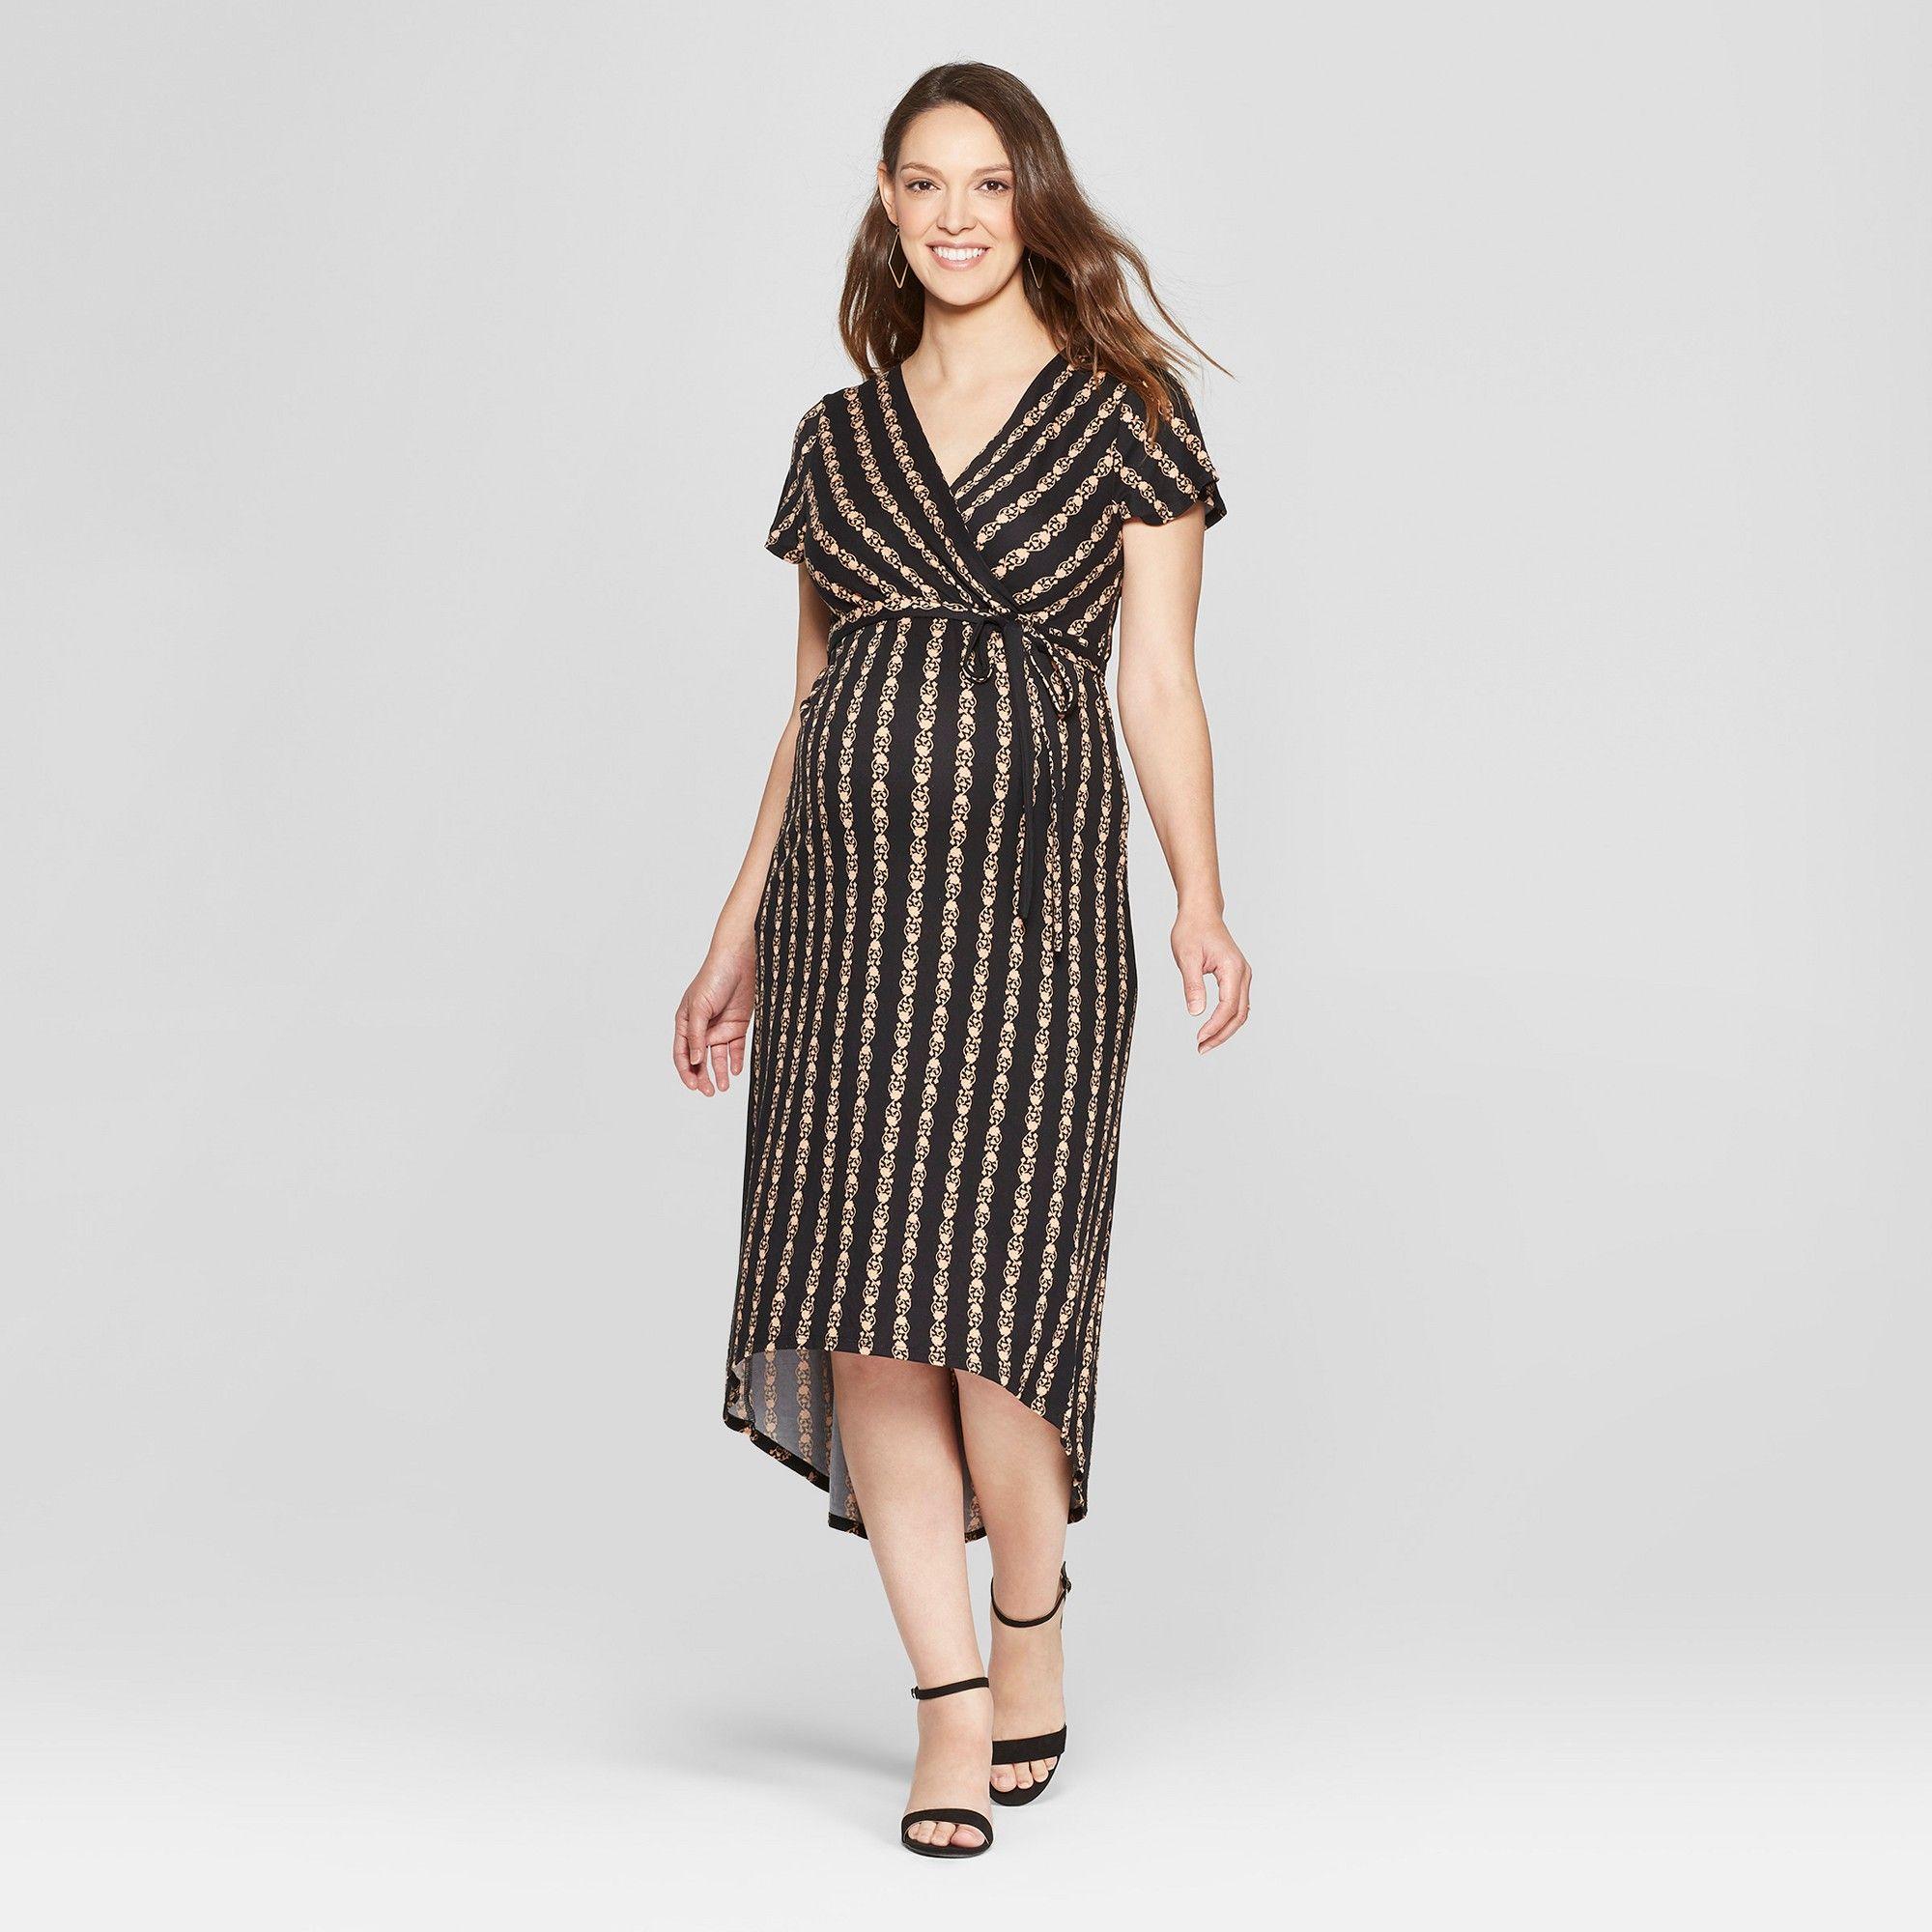 7d7bb46758e Maternity Floral Print Short Sleeve V-Neck High Low Maxi Dress - MaCherie -  Black XL